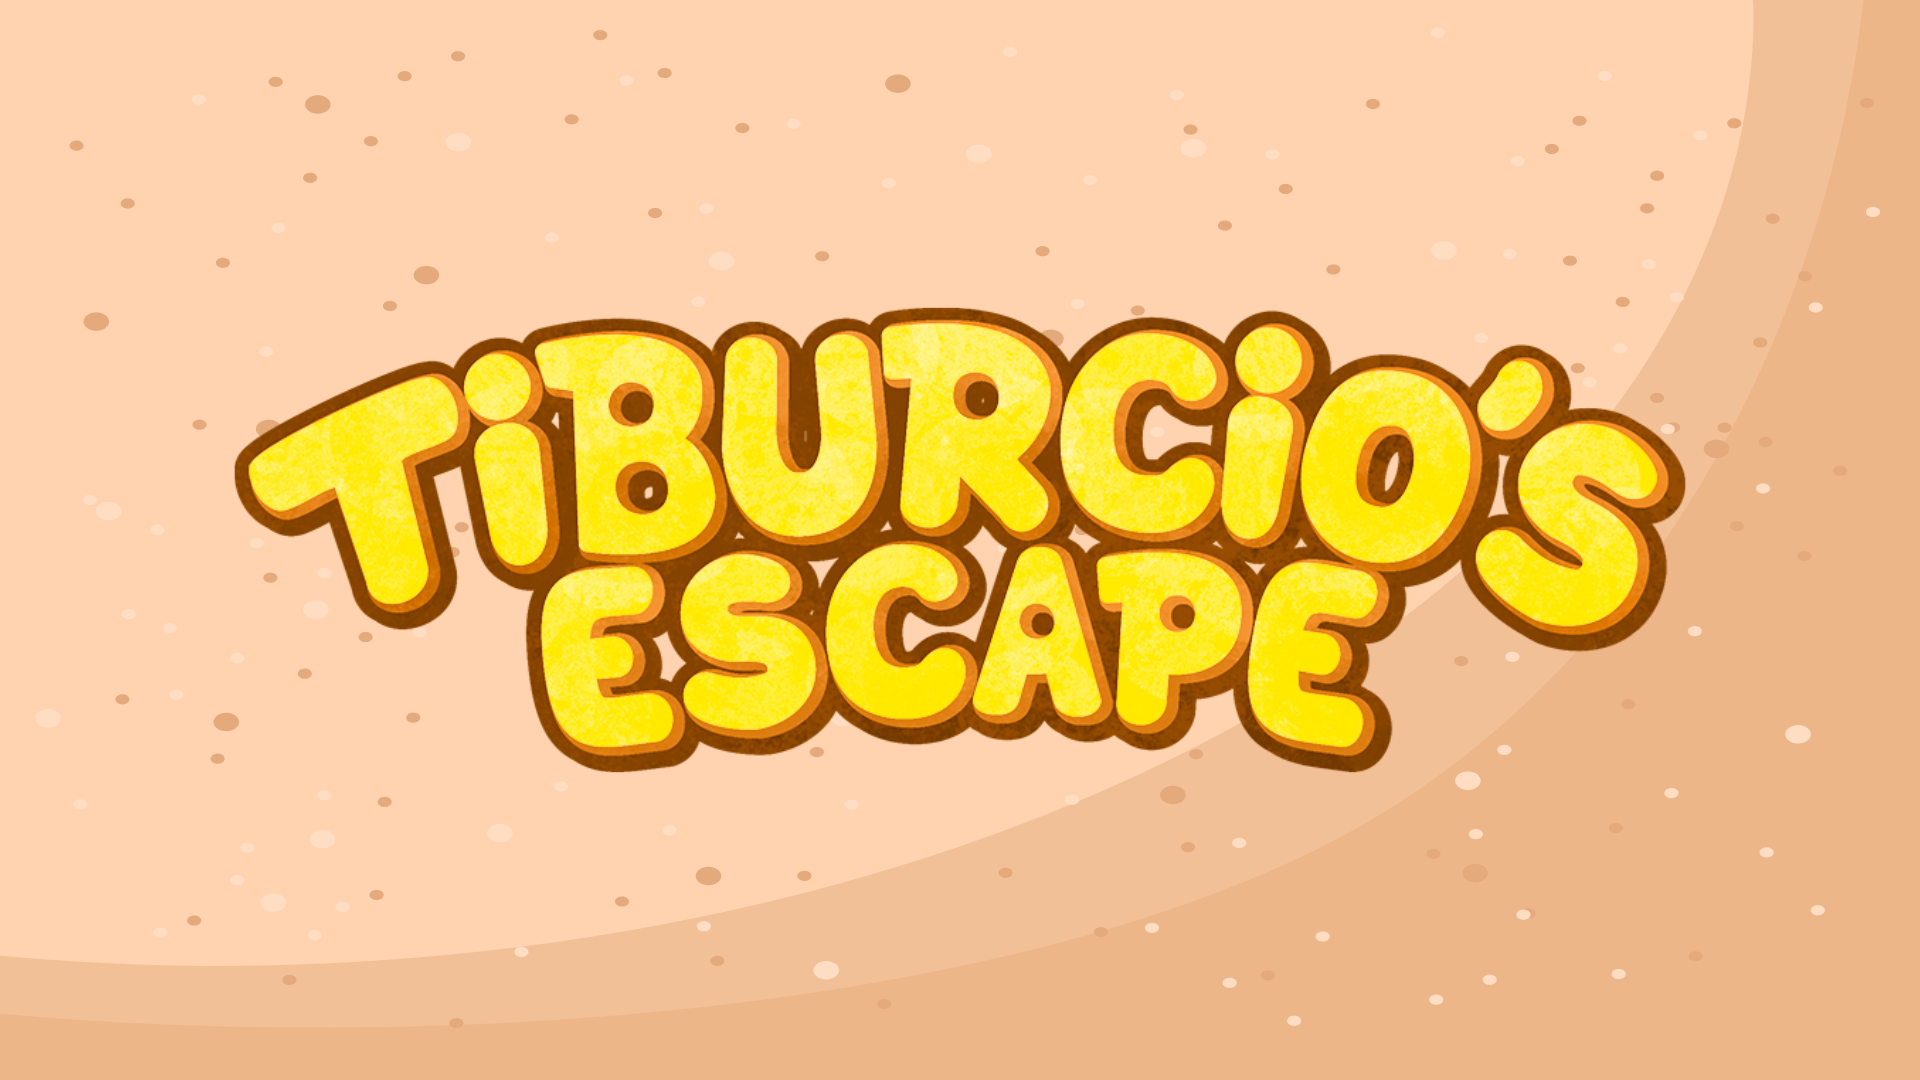 Tiburcio's Escape User Interface